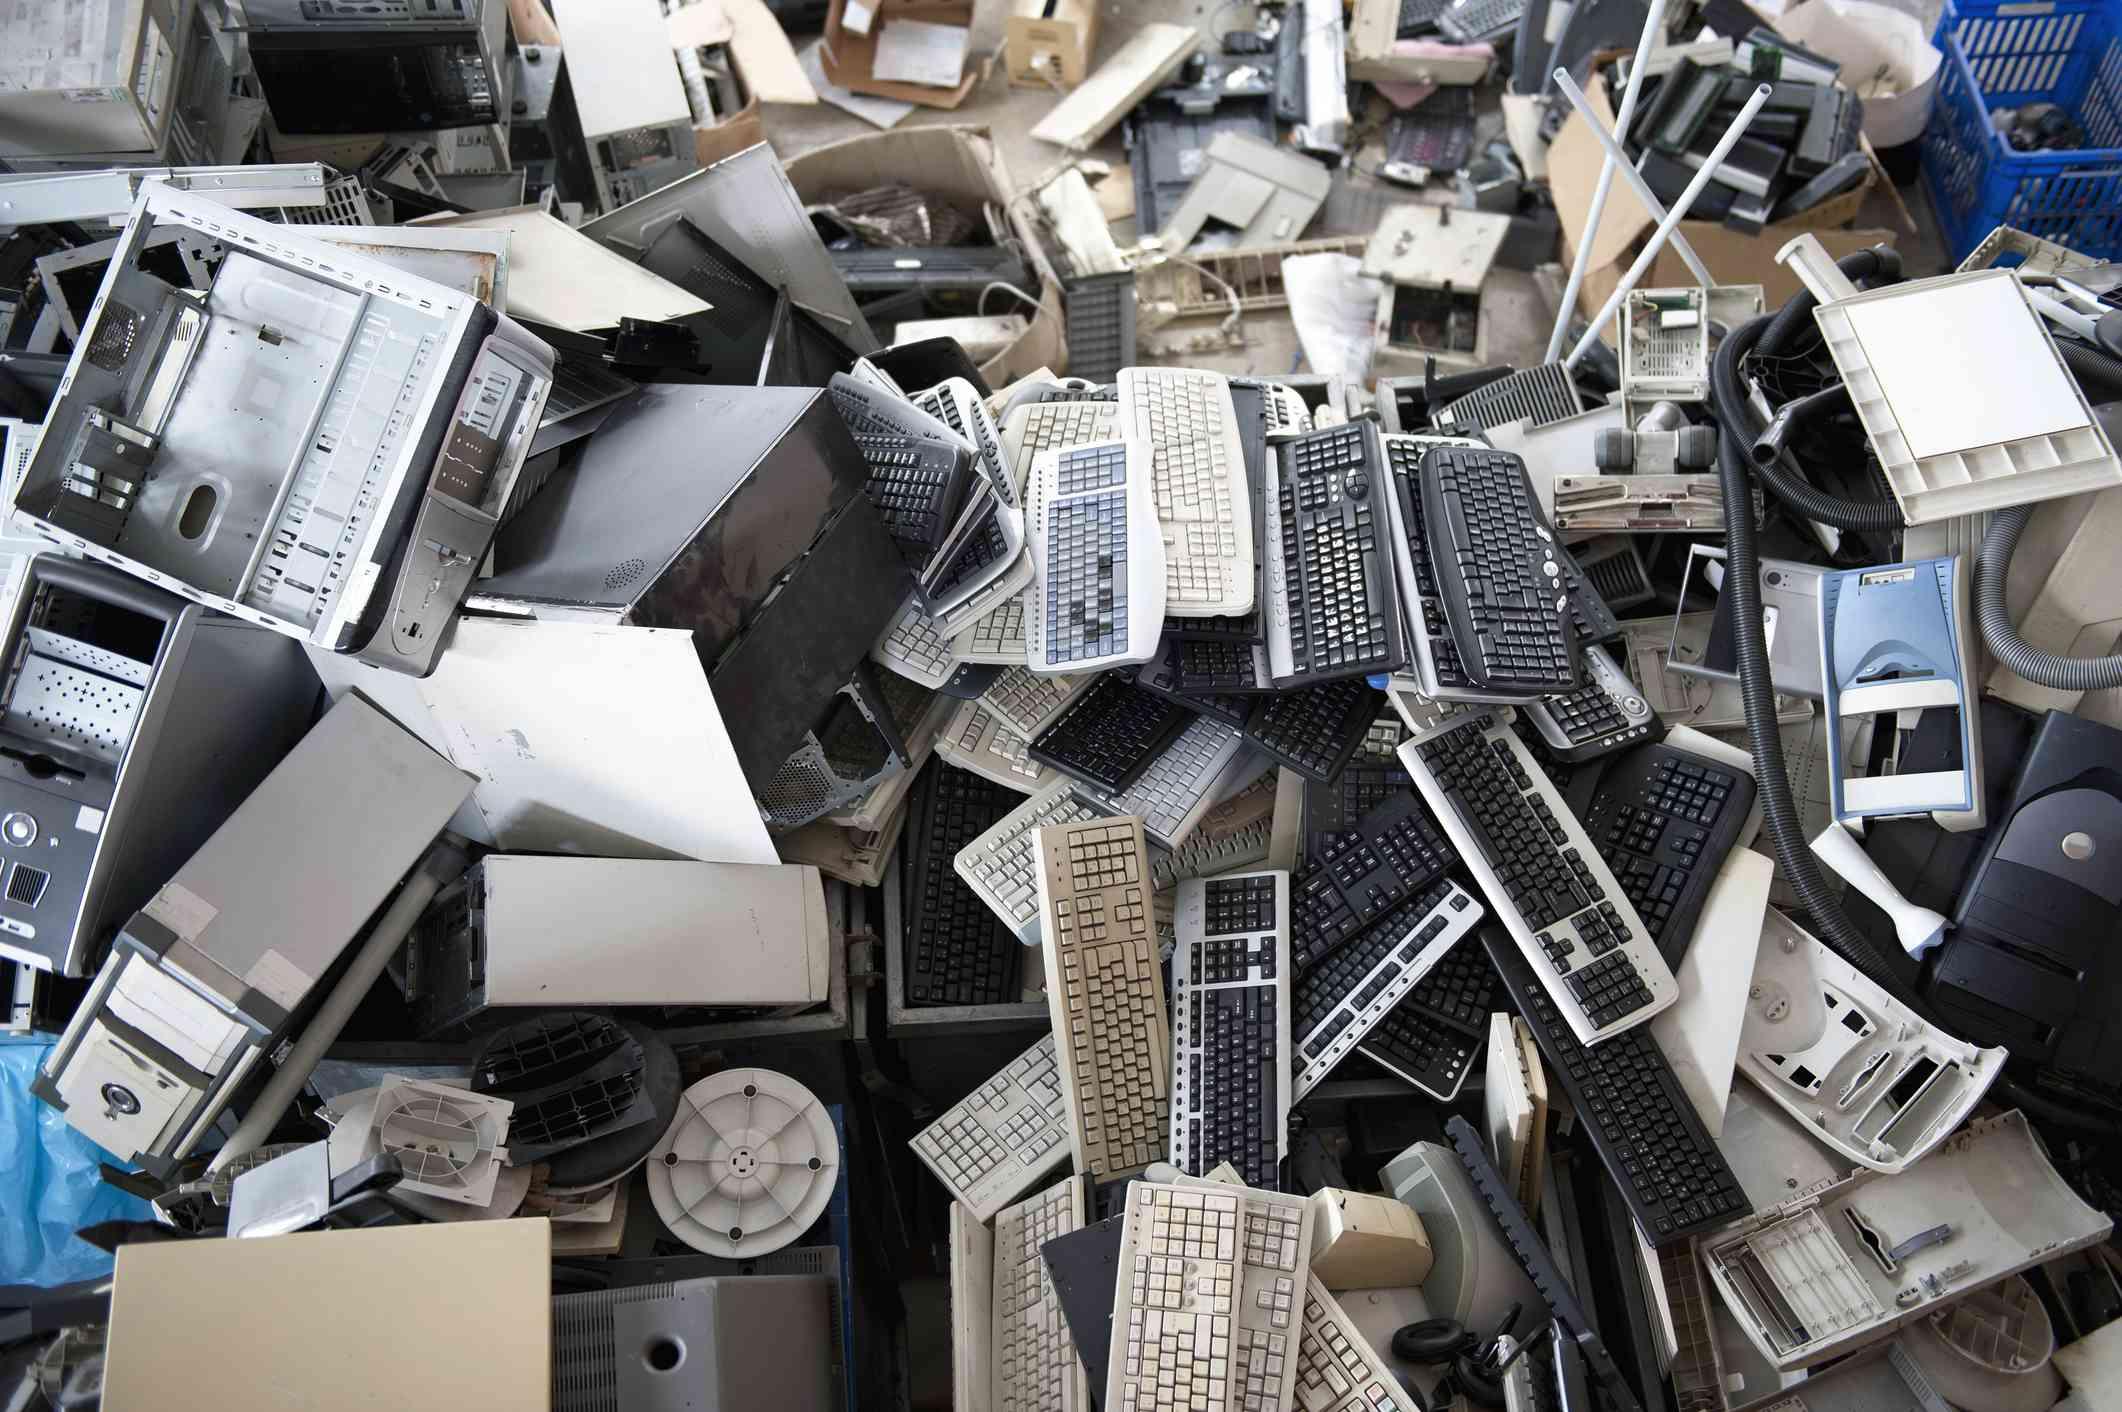 Electronics at a recycling facility.